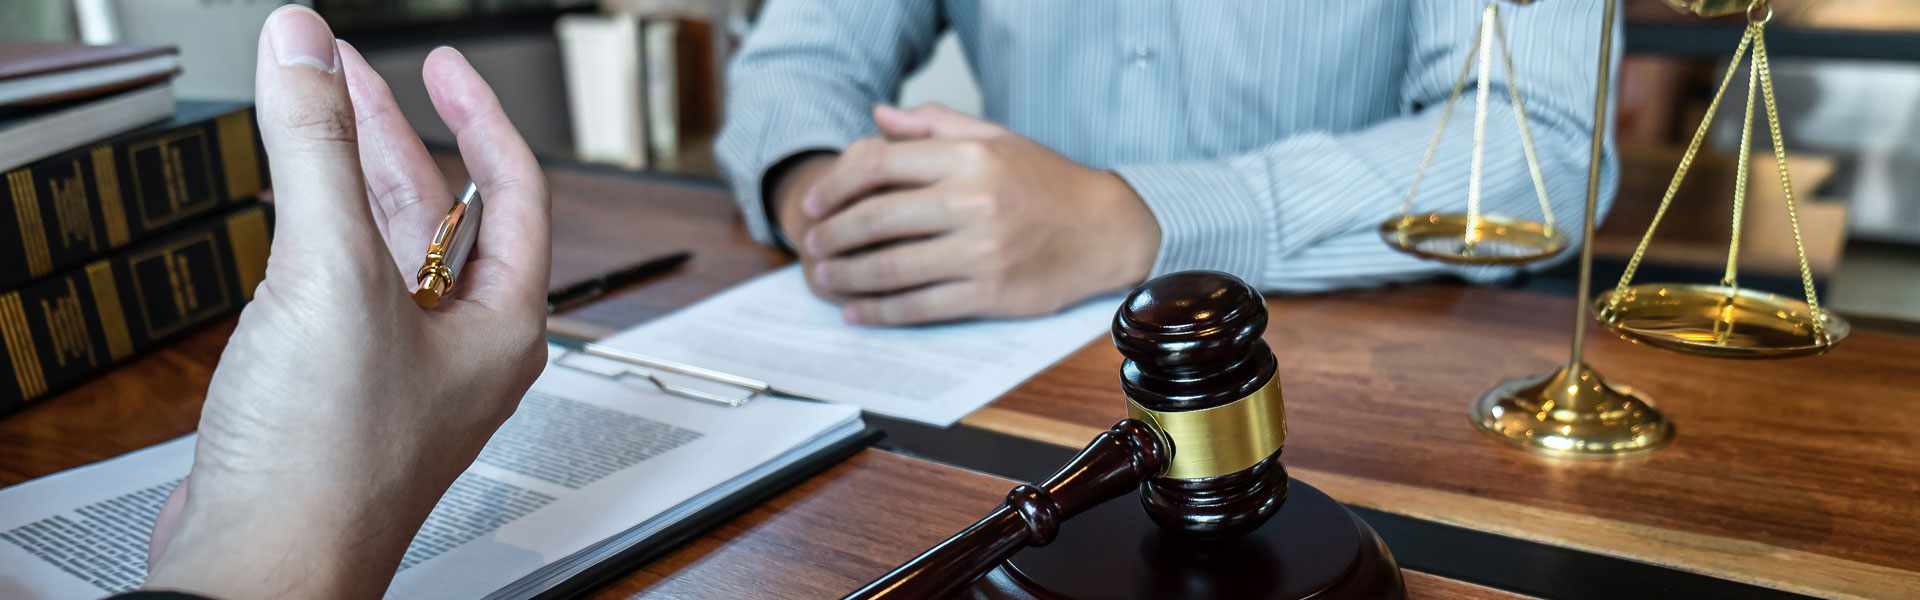 LLM in Business Law - Saint Joseph University - Dubai